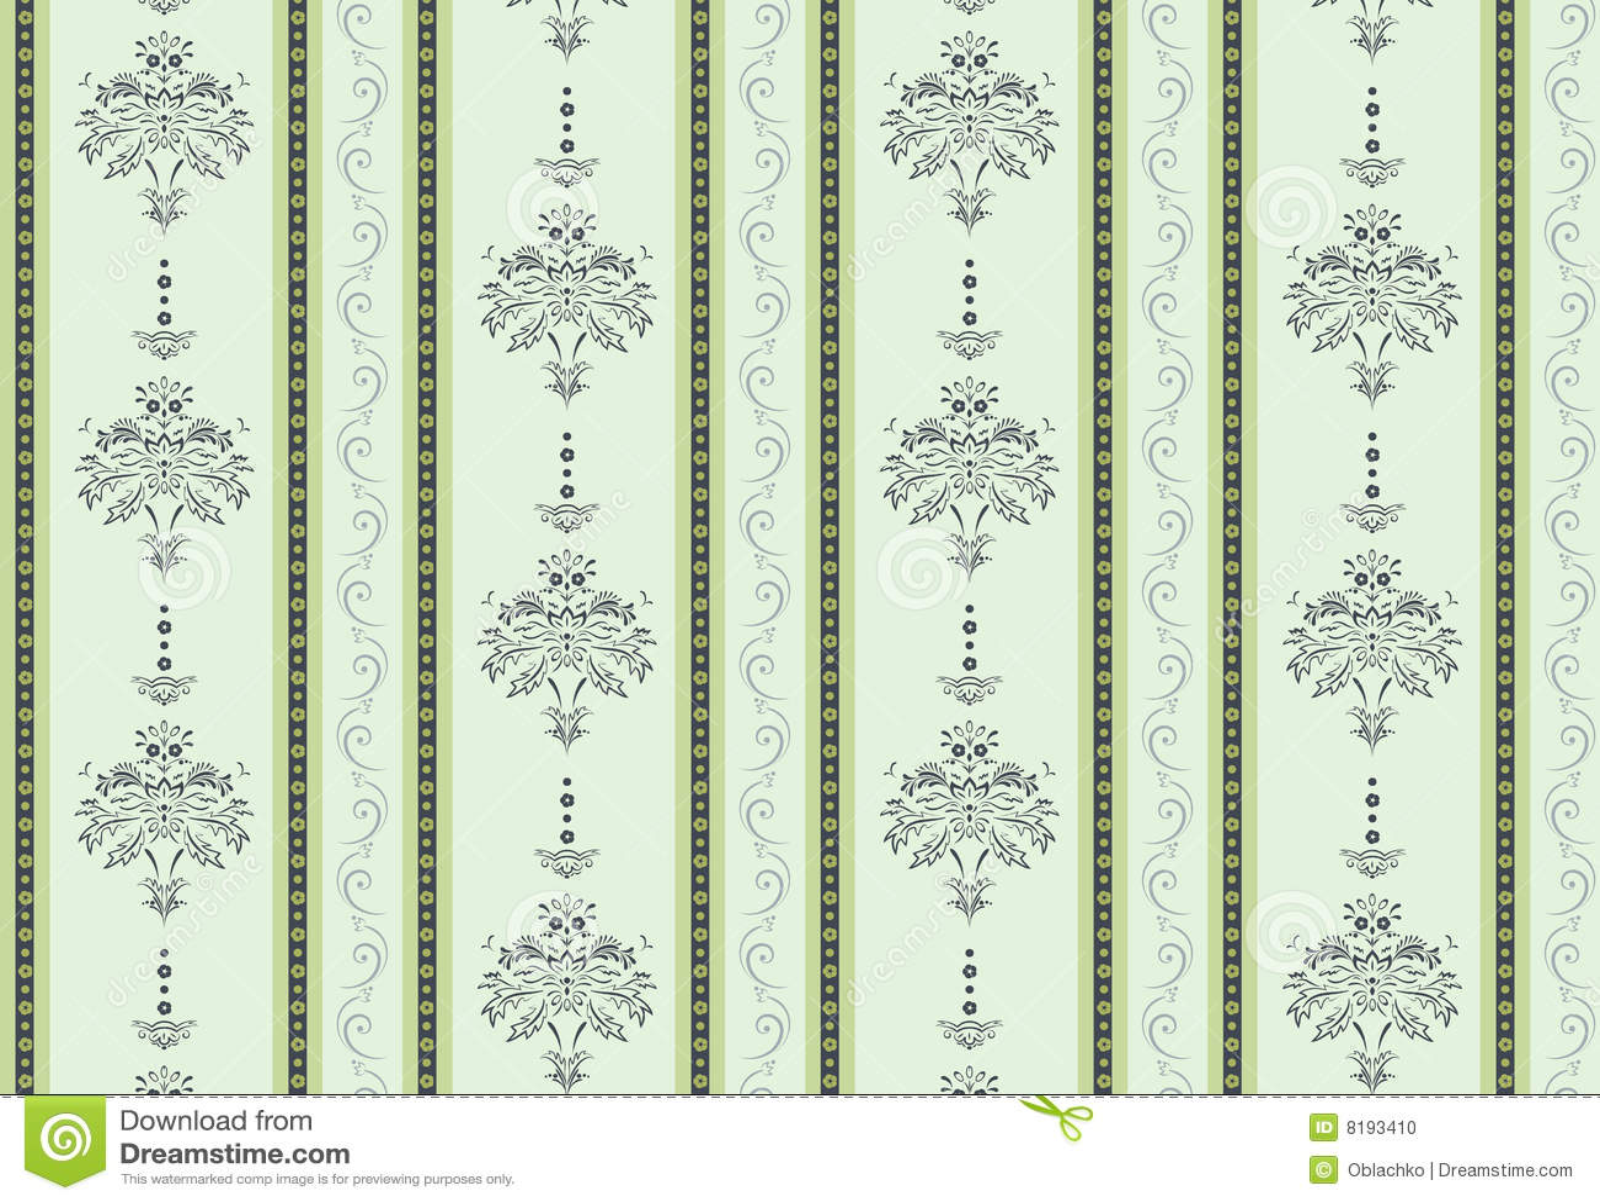 Wallpaper la configuration